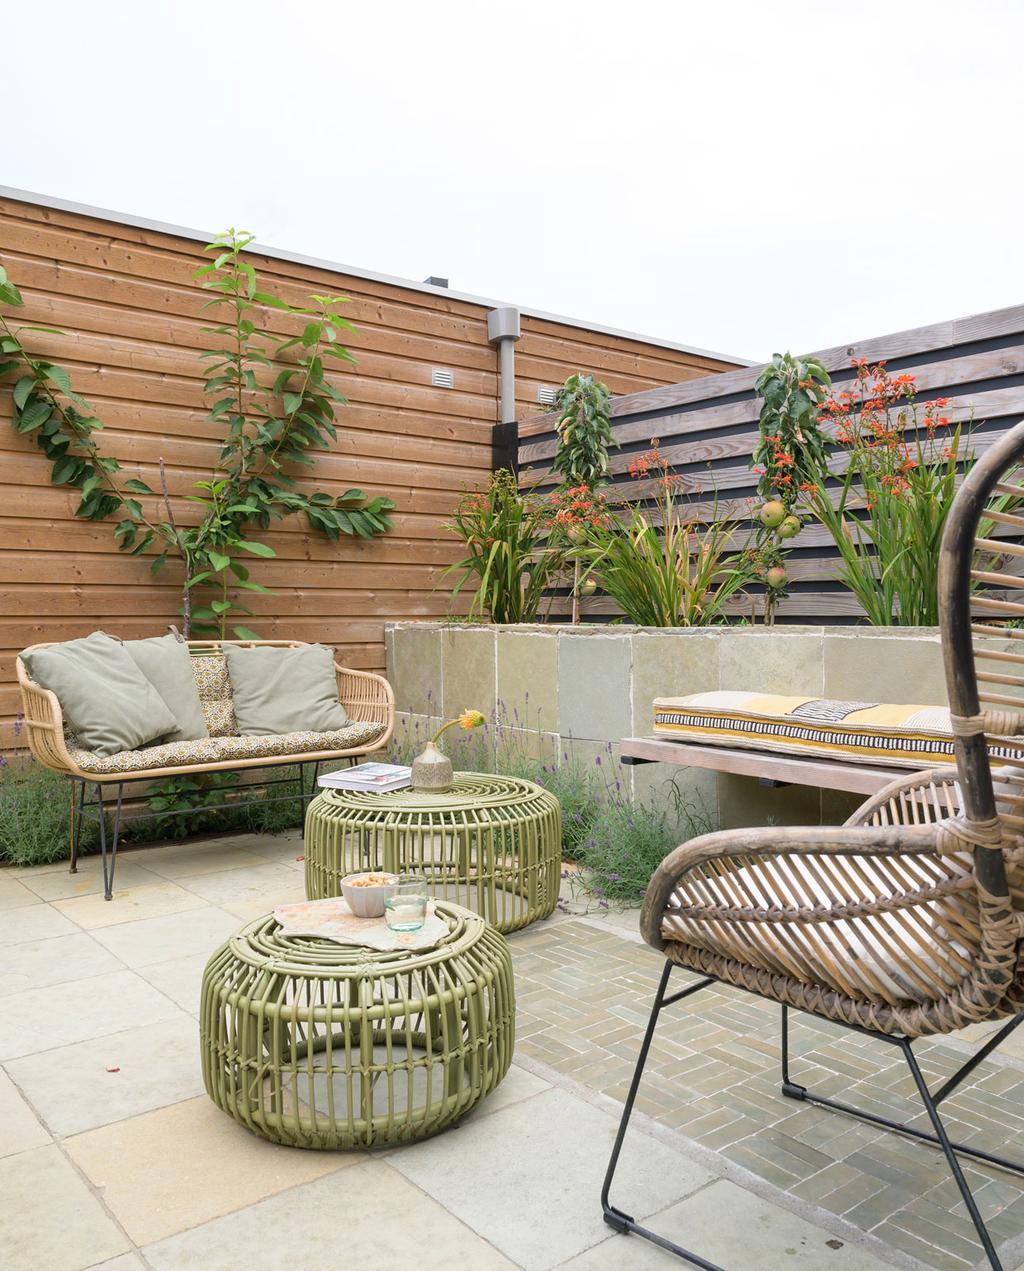 vtwonen 08-2021 | achtertuin stefanie en tommie met houten schutting en rotan tuinmeubilair